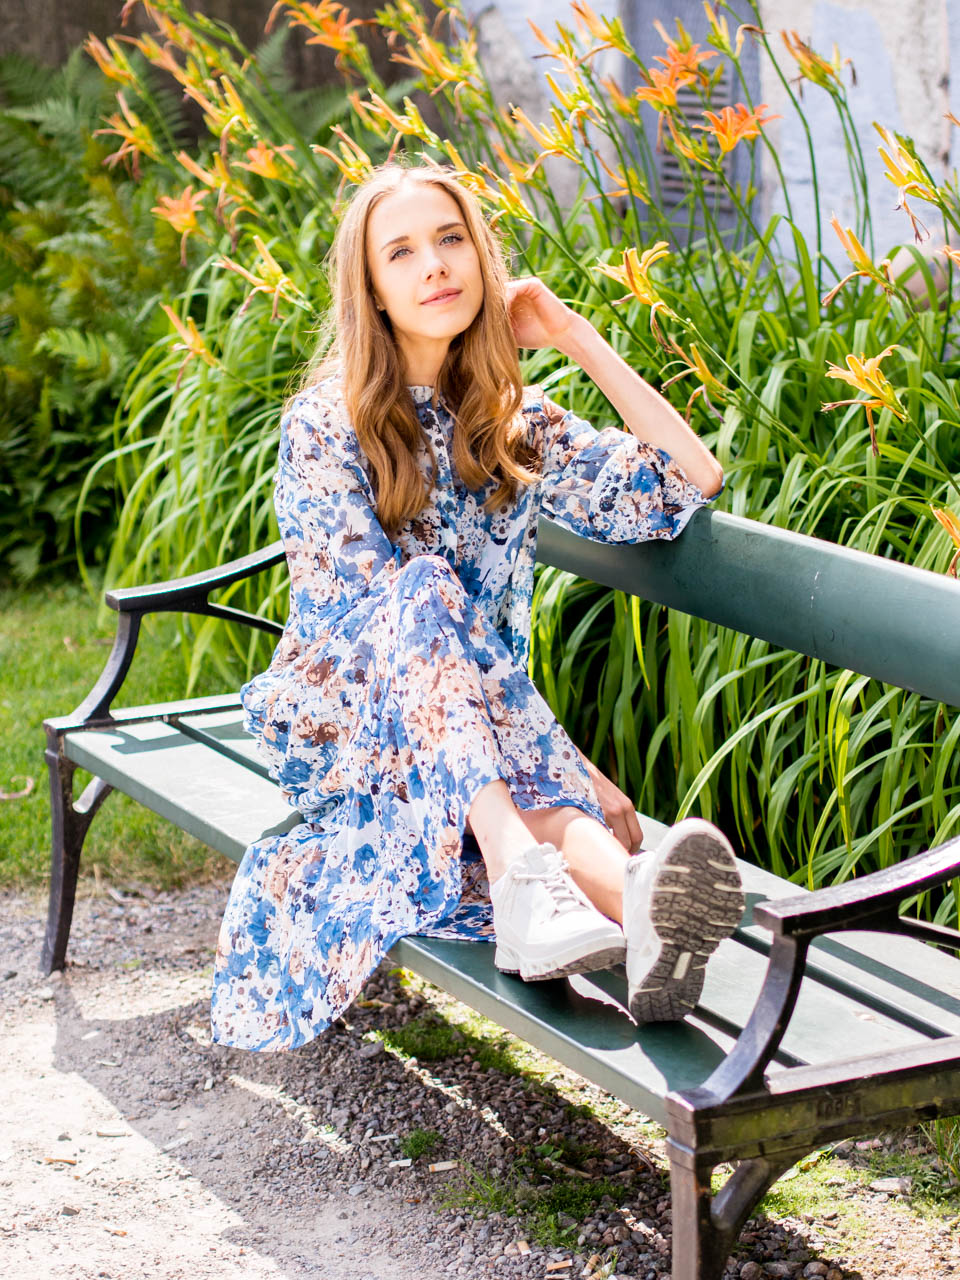 fashion-blogger-outfit-floral-maxi-dress-chunky-sneakers-muotibloggaaja-kukkamekko-maksimekko-lenkkarit